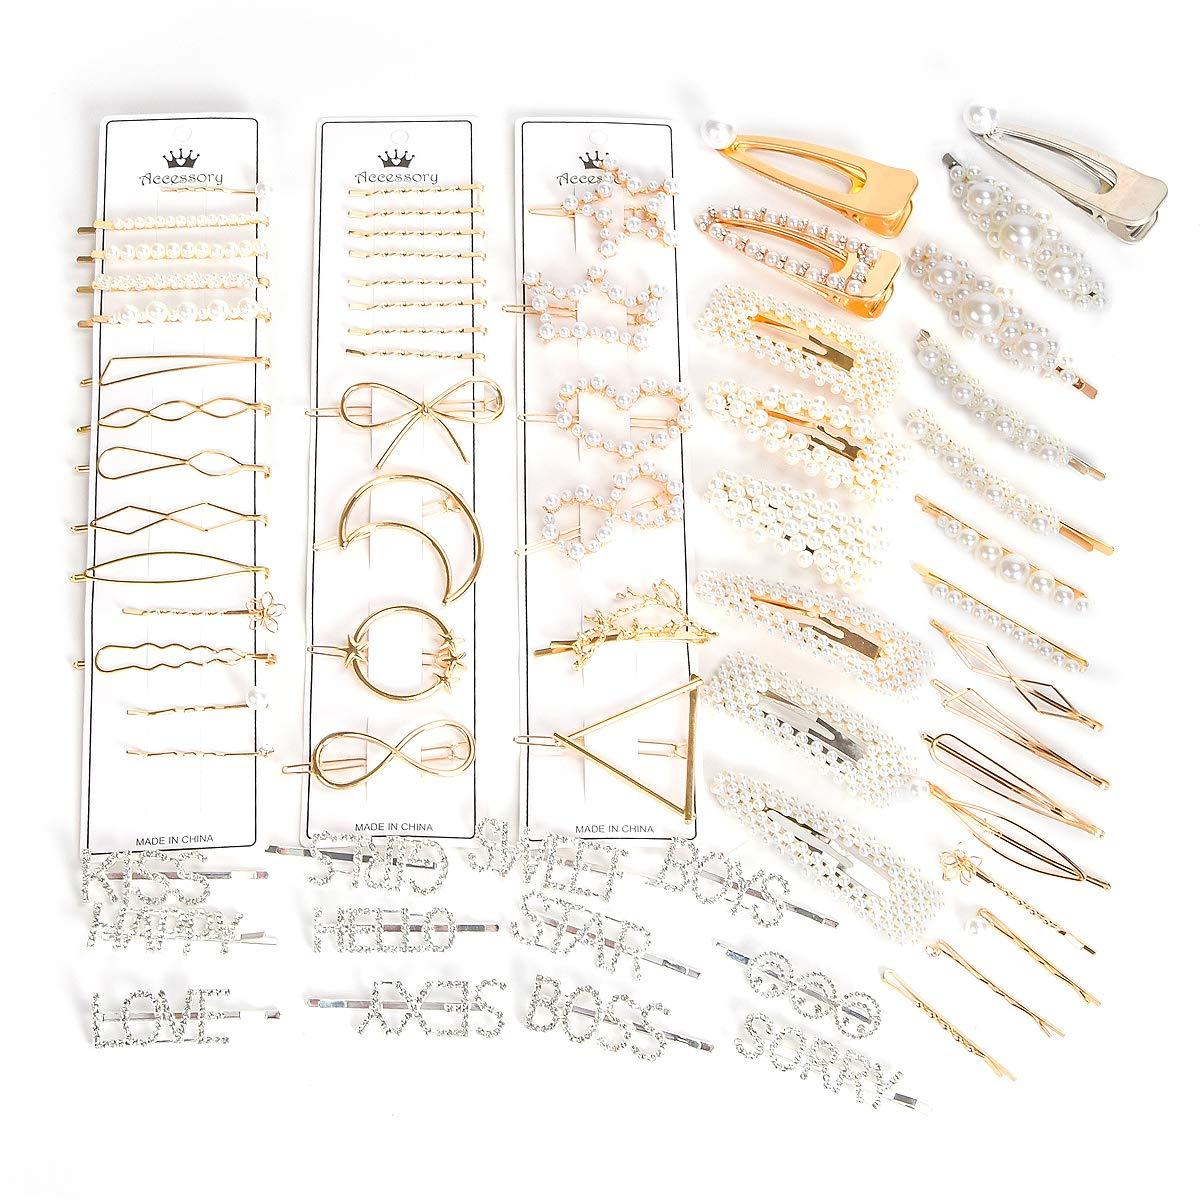 LoiStu 32 Pcs Pearl Hair Clips, Fashion Non-Slip Artificial Pearl Hair Clips, Sweet and Elegant Decorative Hair Clips for Party, Wedding, Daily (11 PCS) by LoiStu